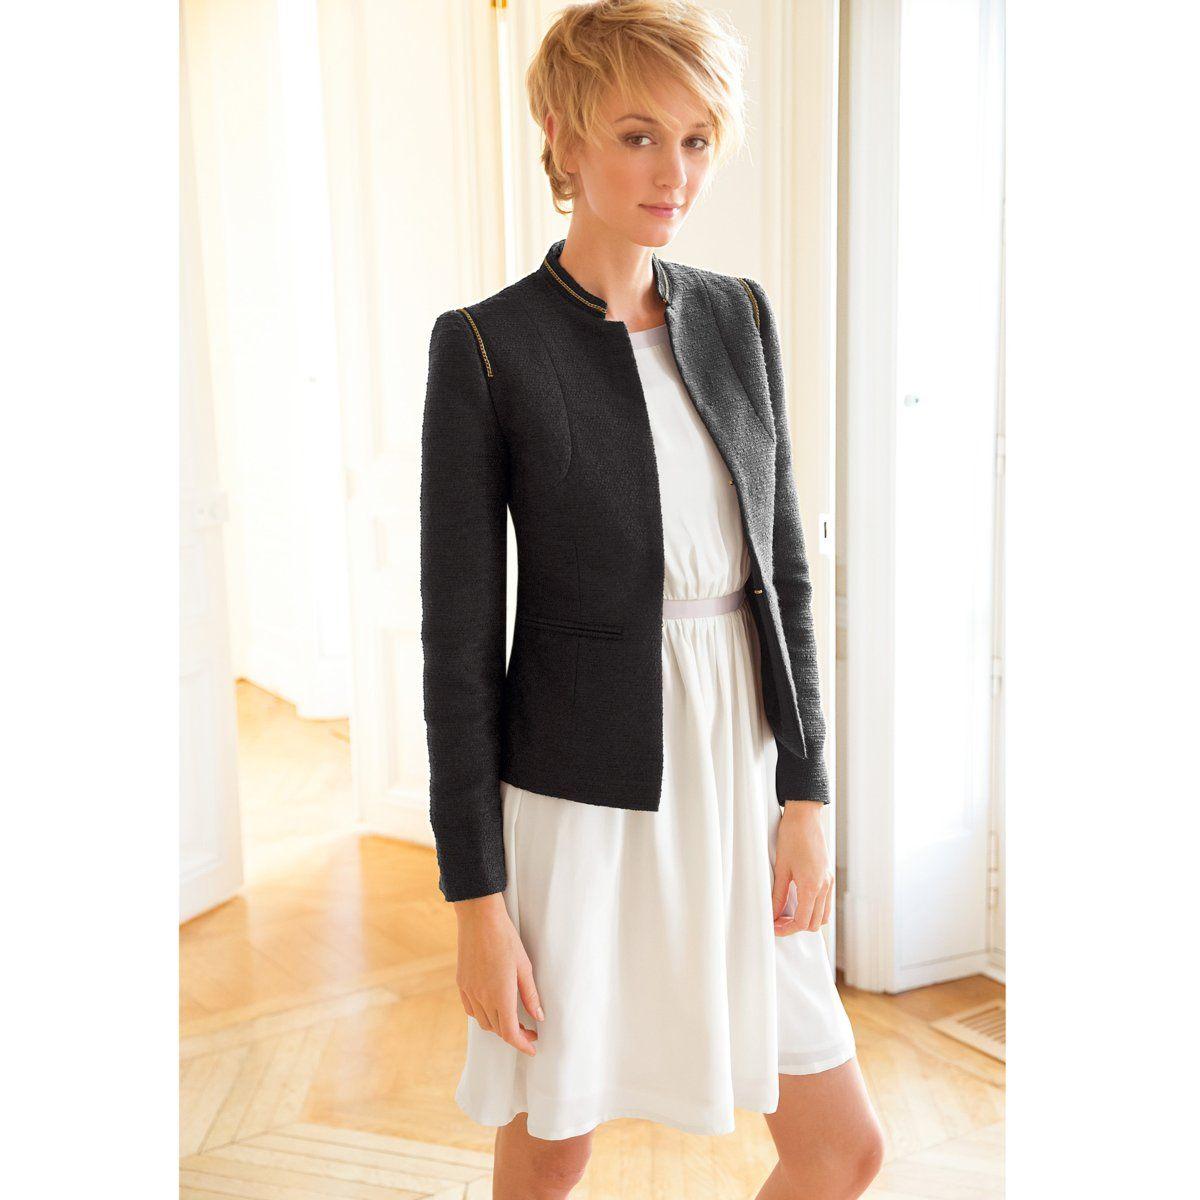 Casaco curto, cintado, estilo alta costura, em pele tweed